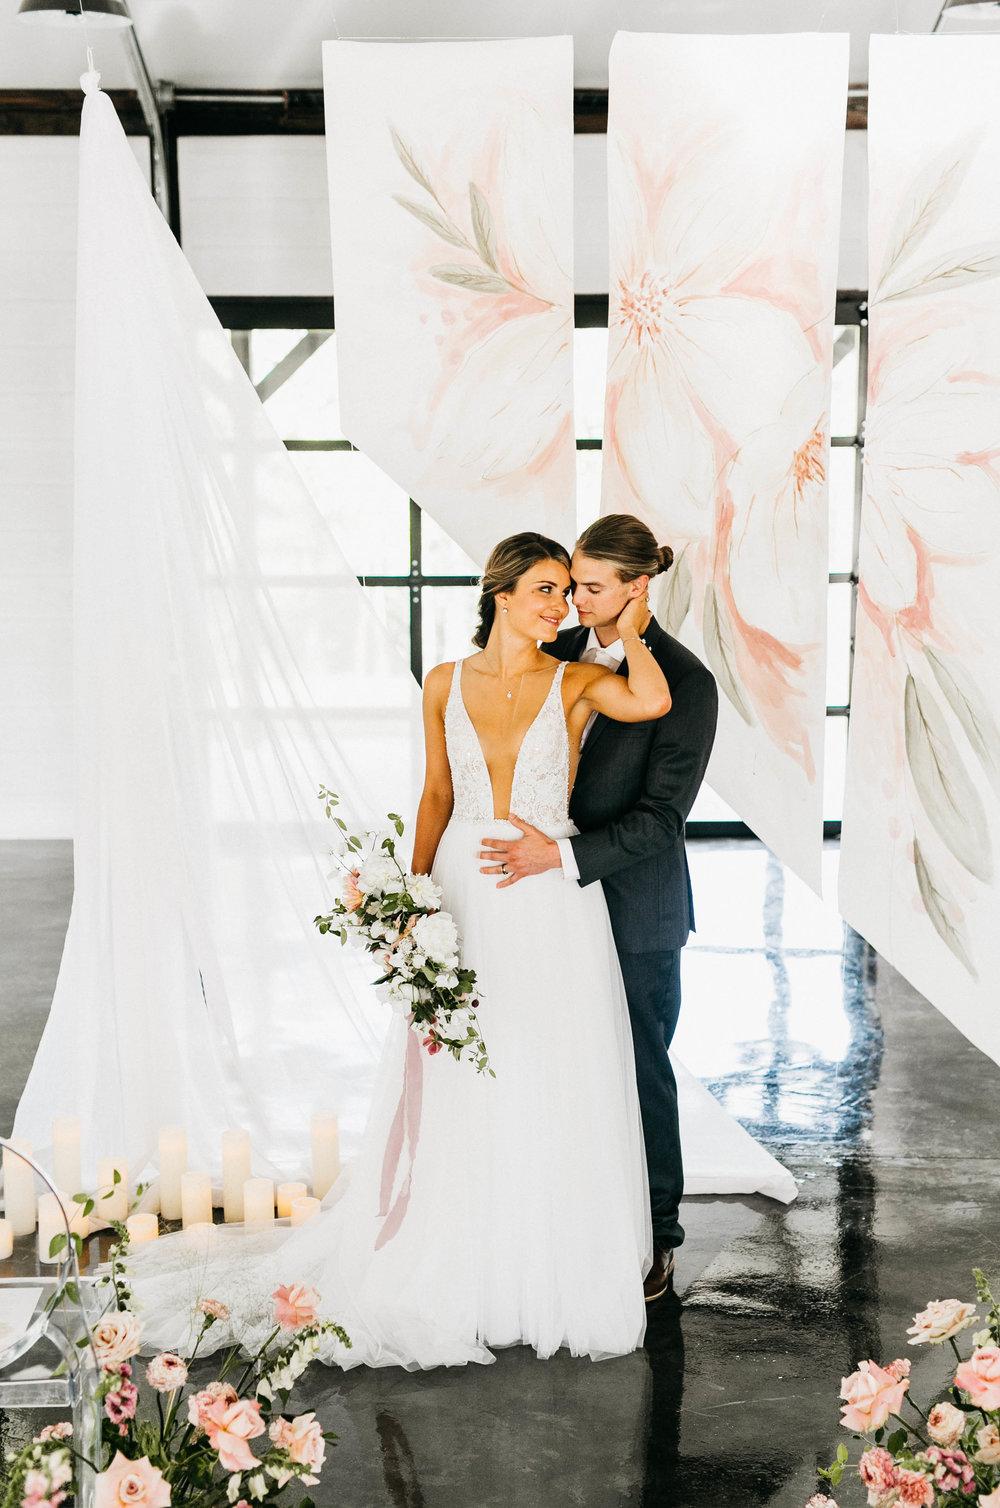 Brides of Oklahoma Tulsa Wedding Venue 9-min.jpg